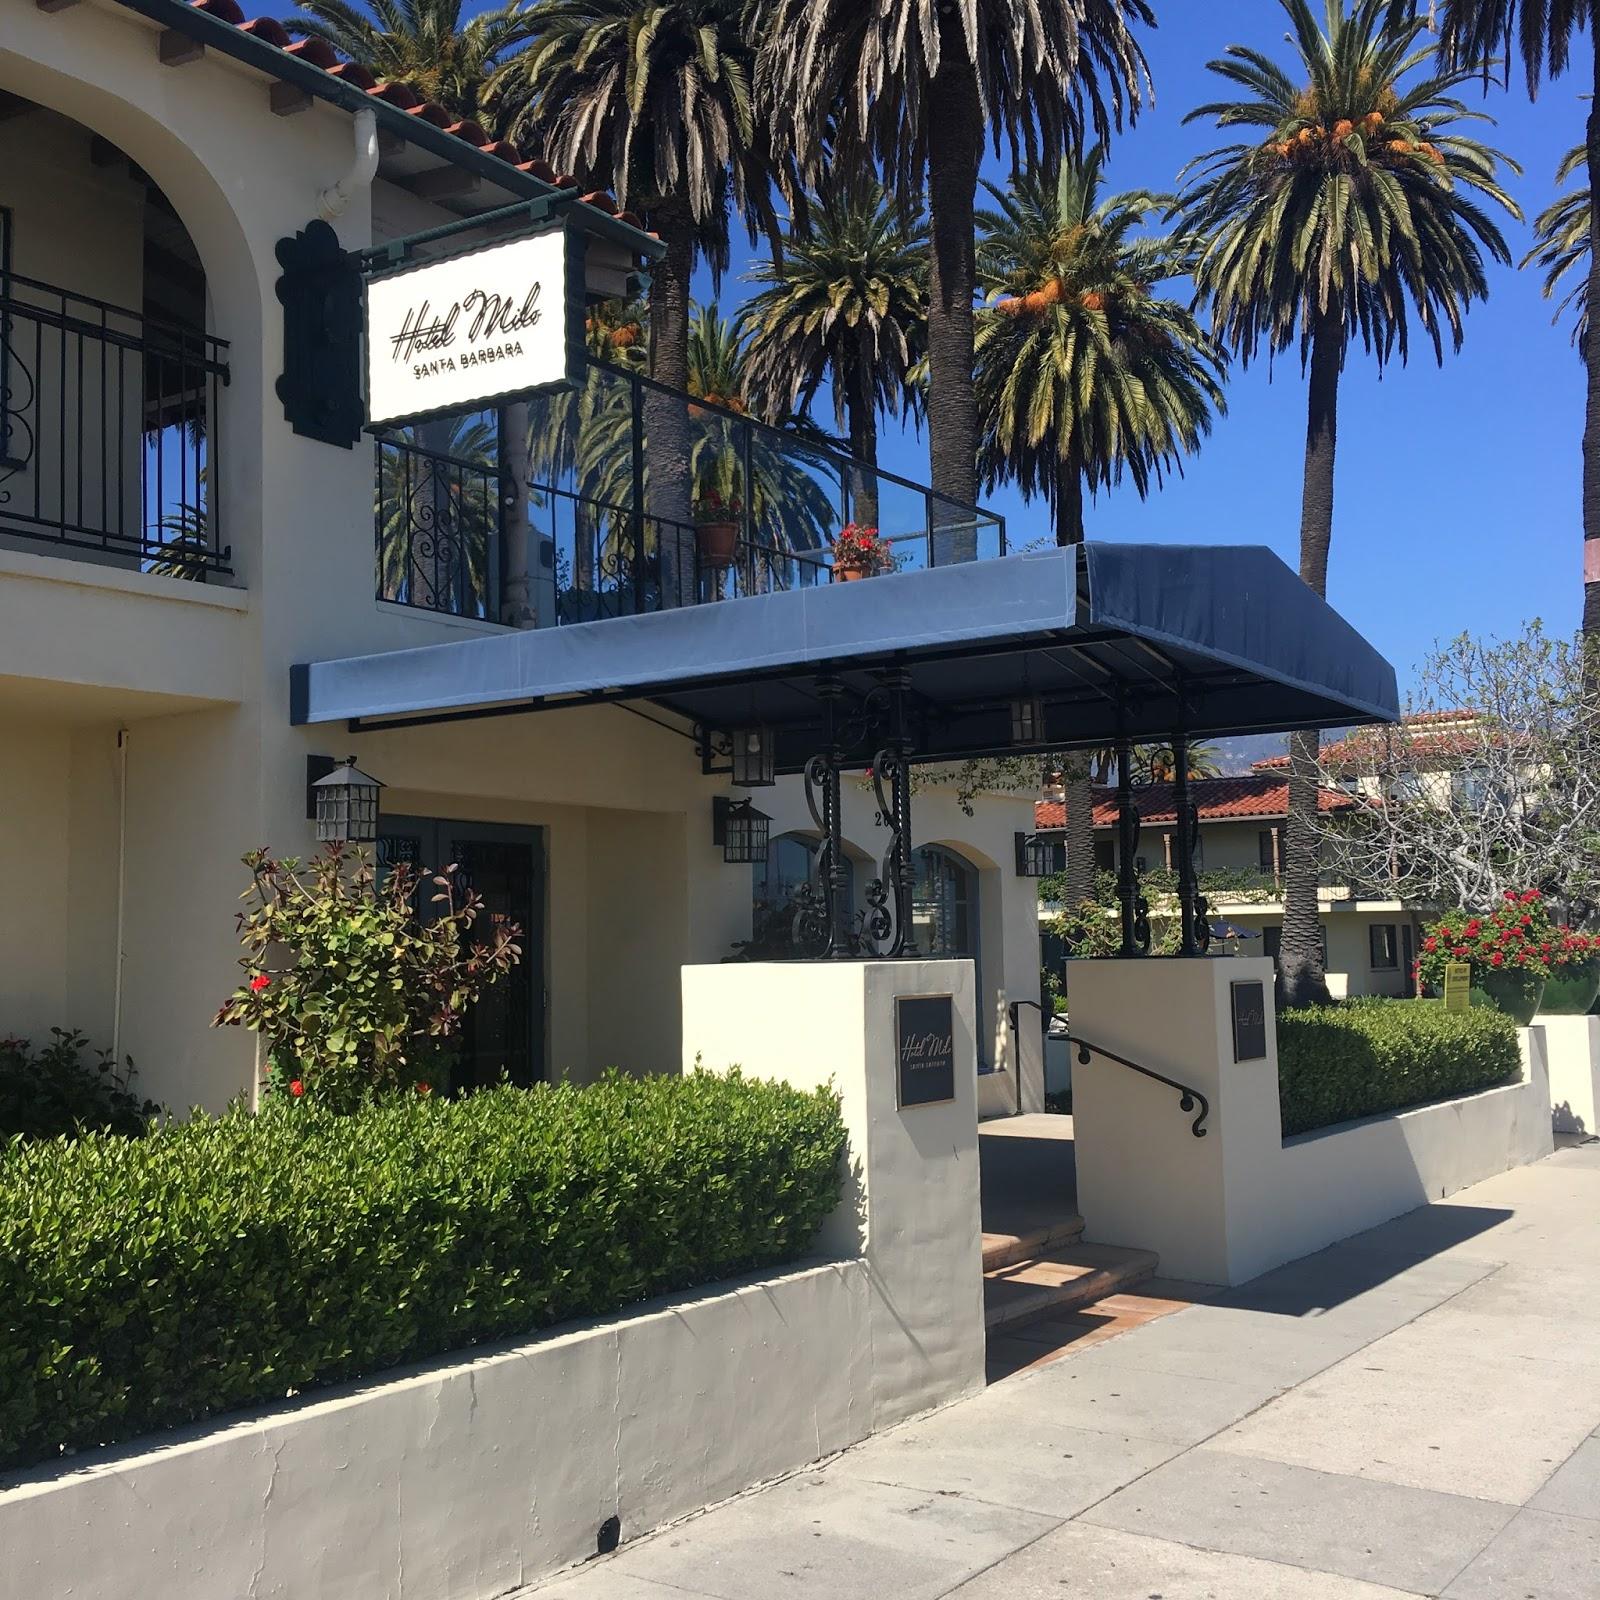 Santa Barbara Hotel, Hotel Milo, Beachfront Hotel